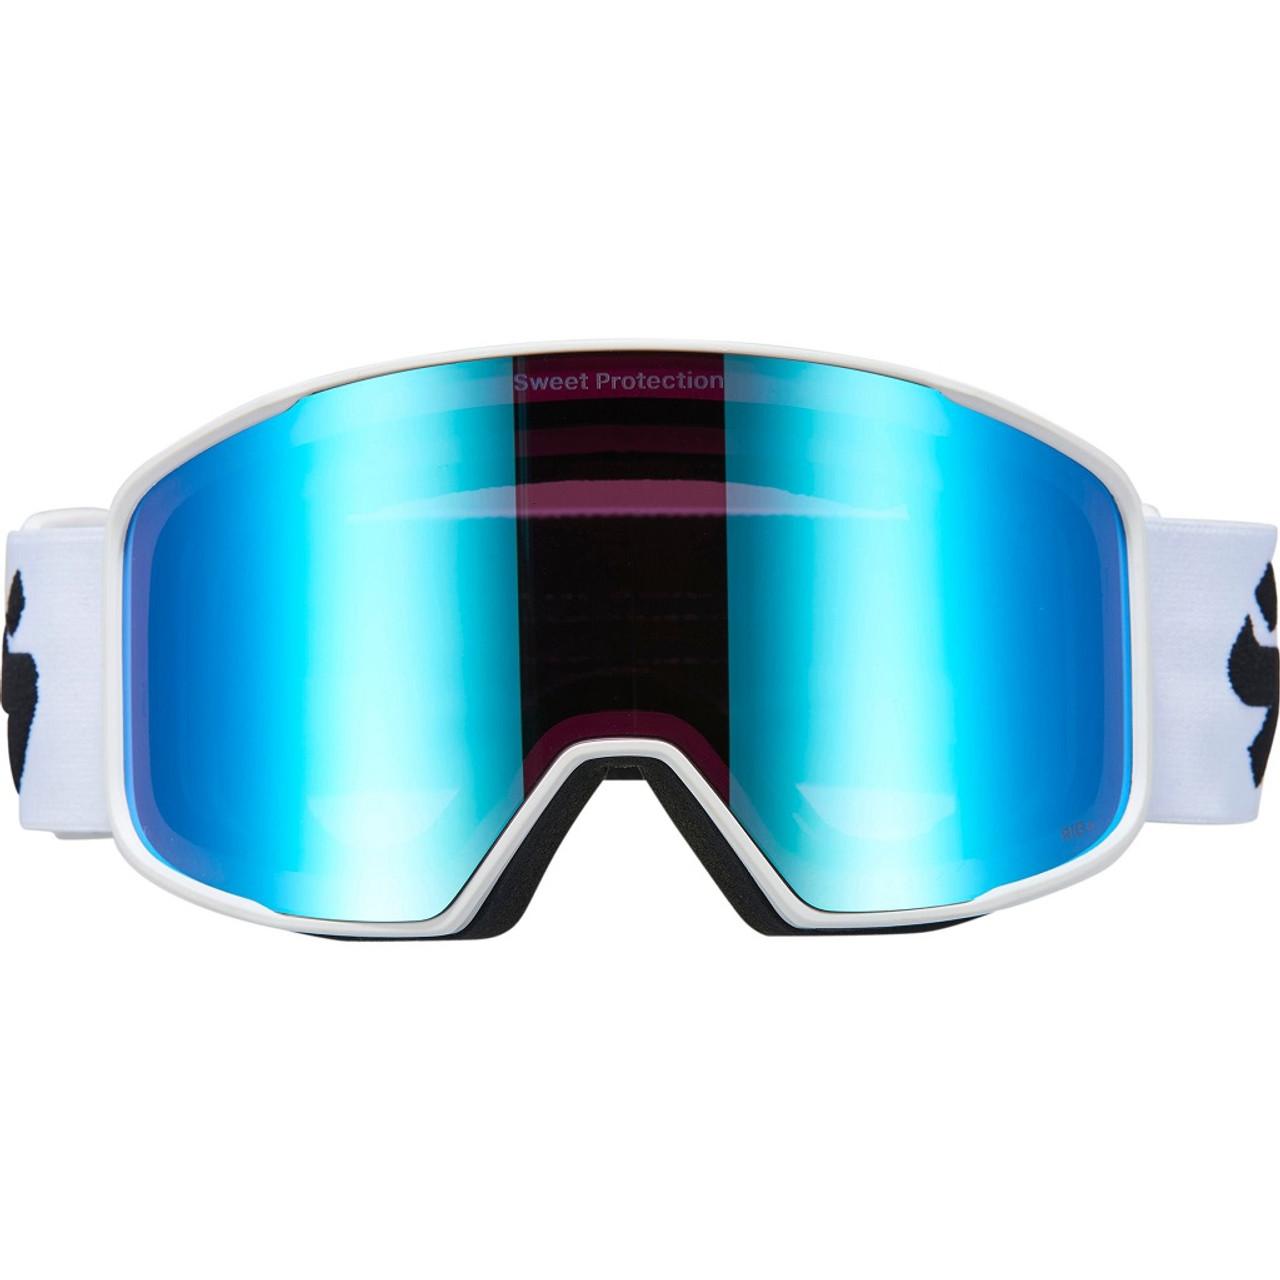 RIG Reflect Aquamarine - Sweet Protection Boondock Lenses